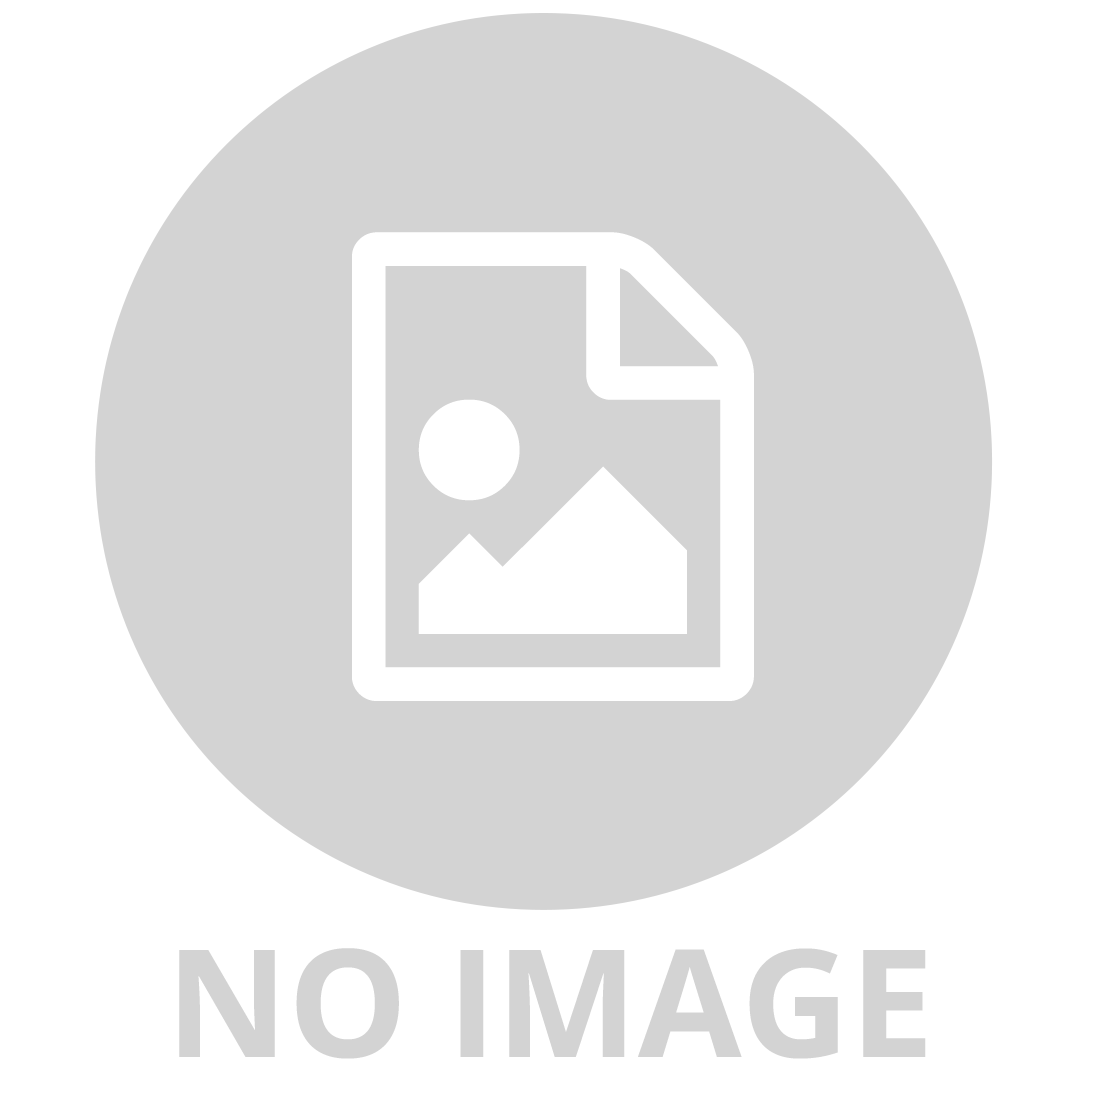 MELISSA & DOUG GOOGLY EYES GOOFY ANIMALS COLOURING PAD